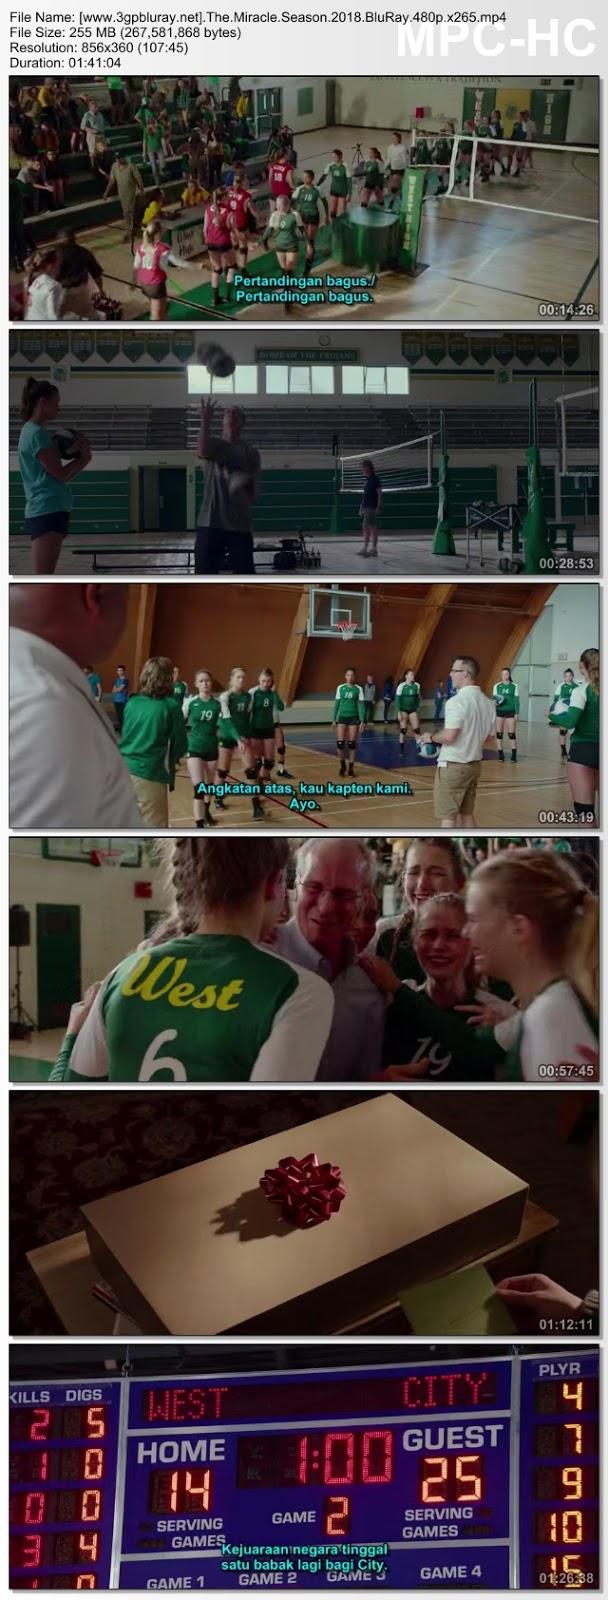 Screenshots Download The Miracle Season (2018) BluRay 480p & 3GP Subtitle Indonesia